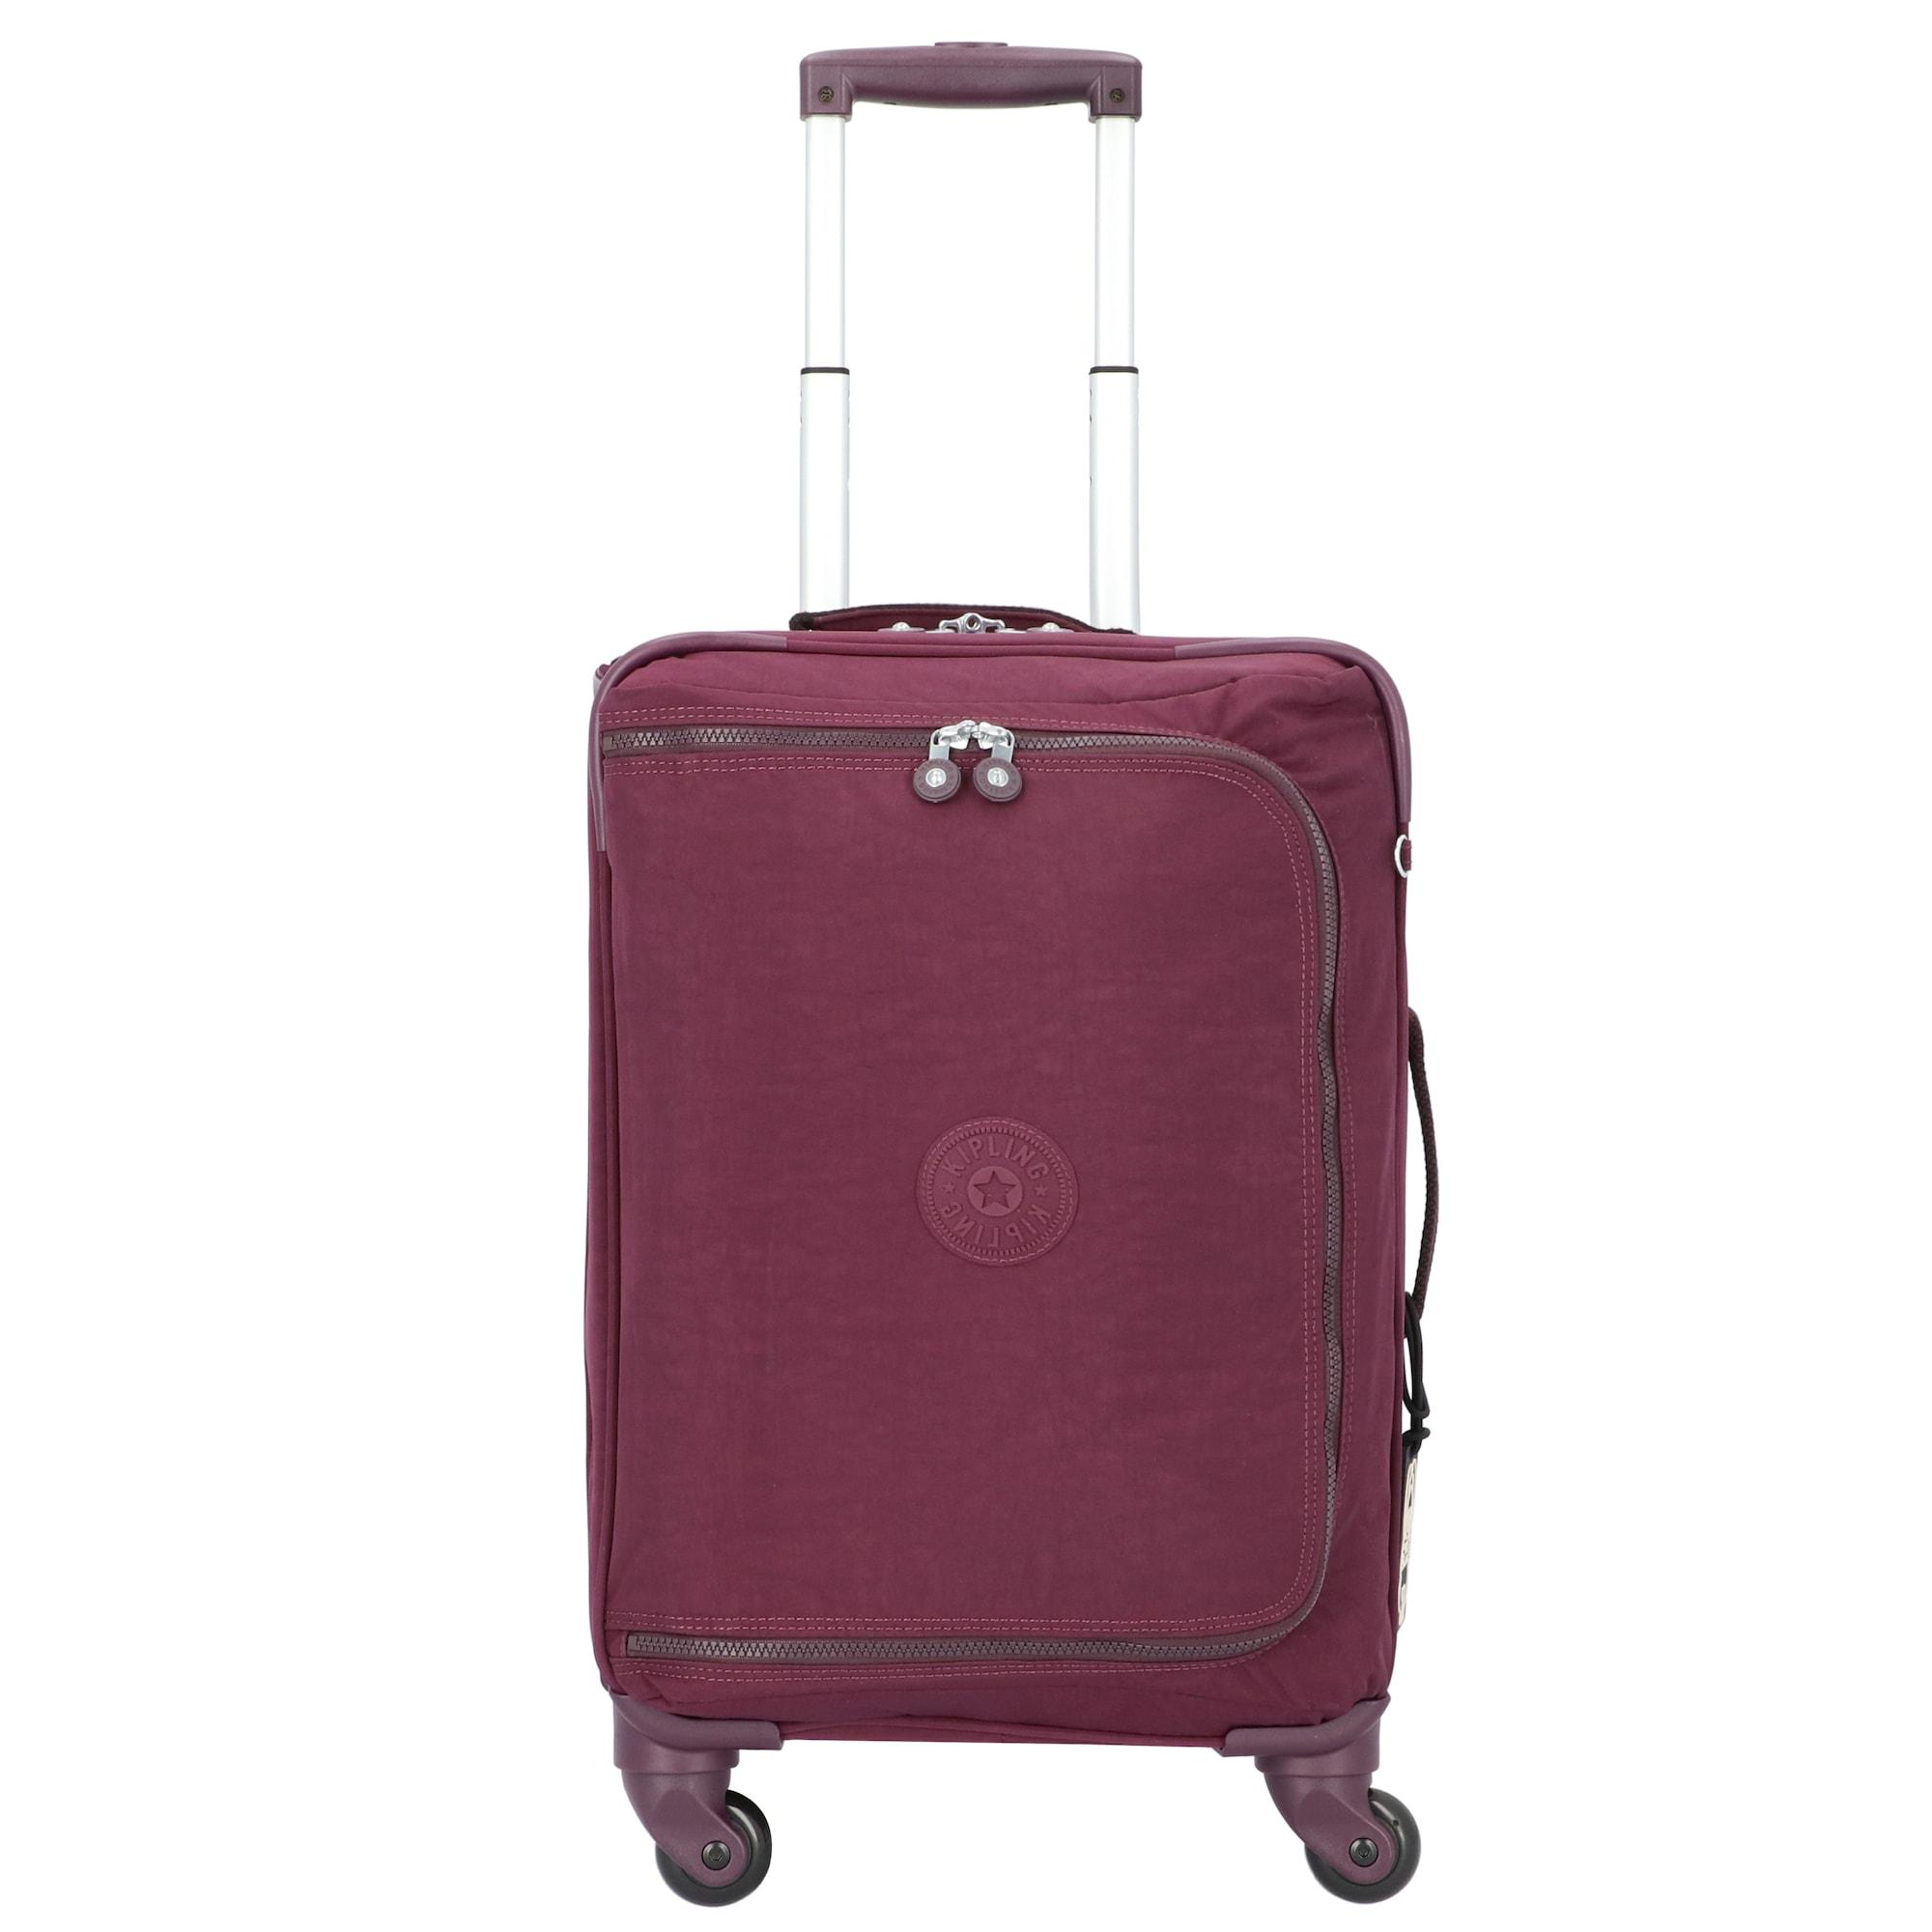 Trolley 'Cyrah S' | Taschen > Koffer & Trolleys > Trolleys | KIPLING